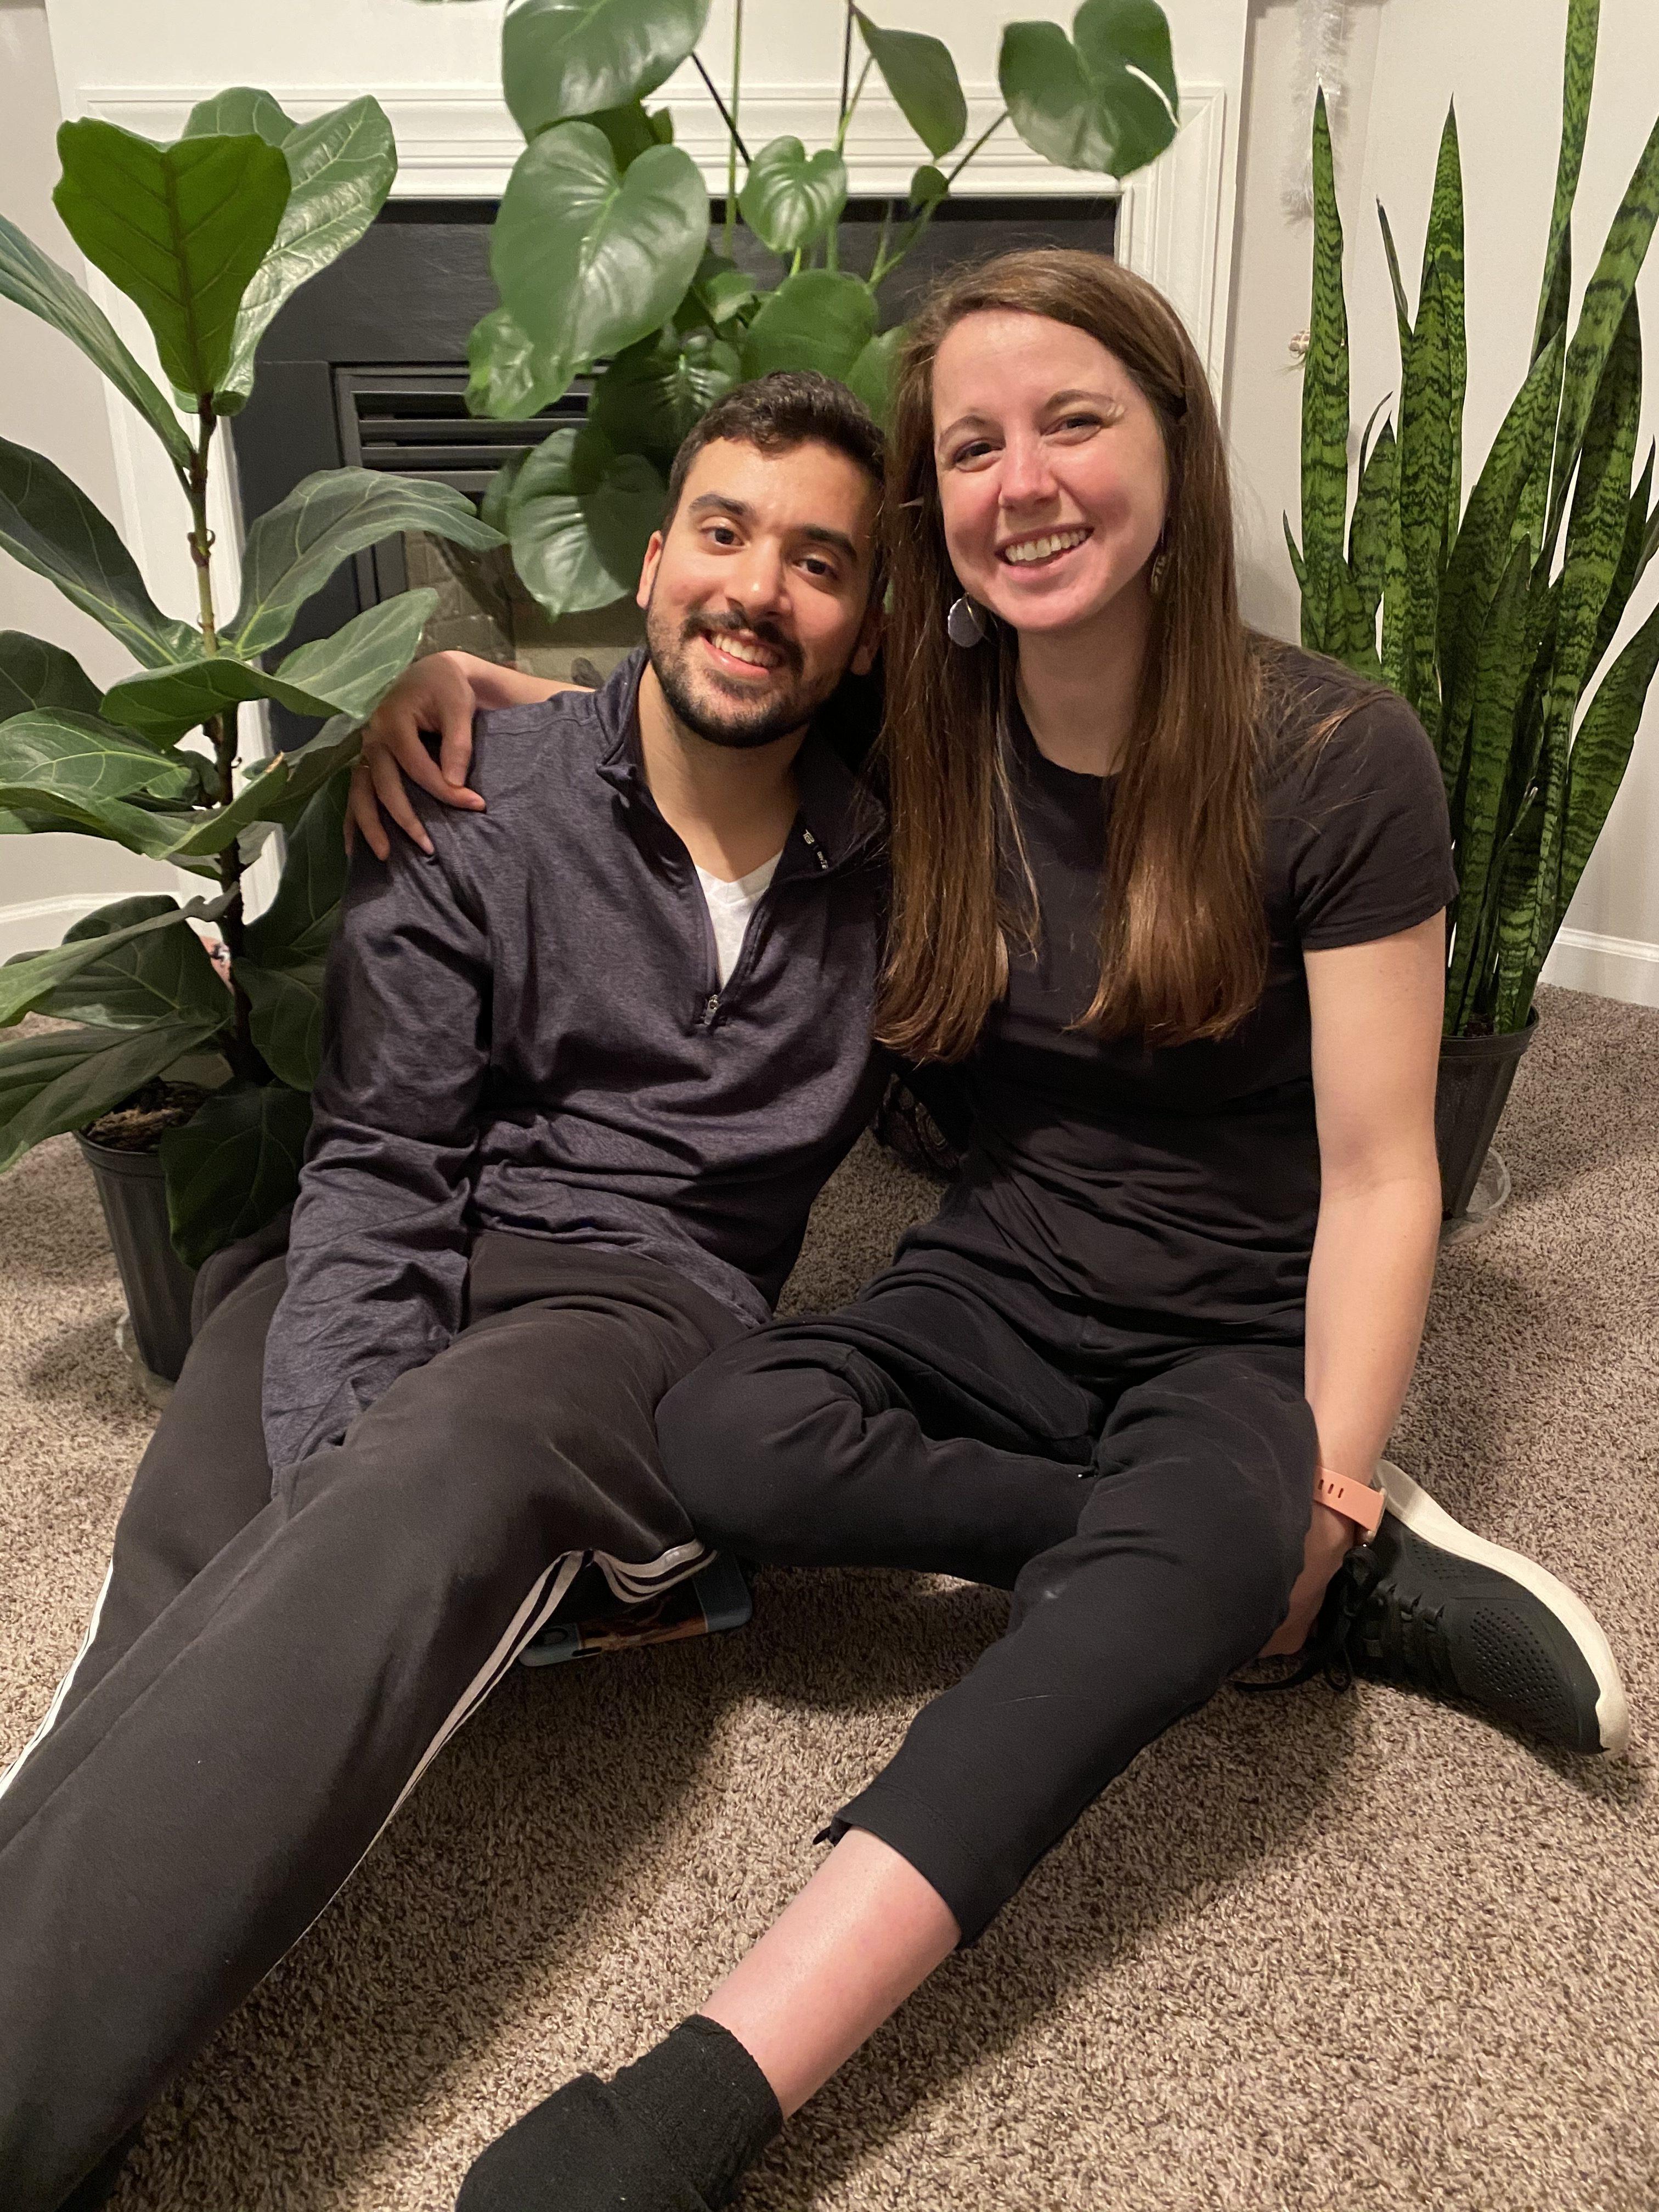 Kristin and fiance